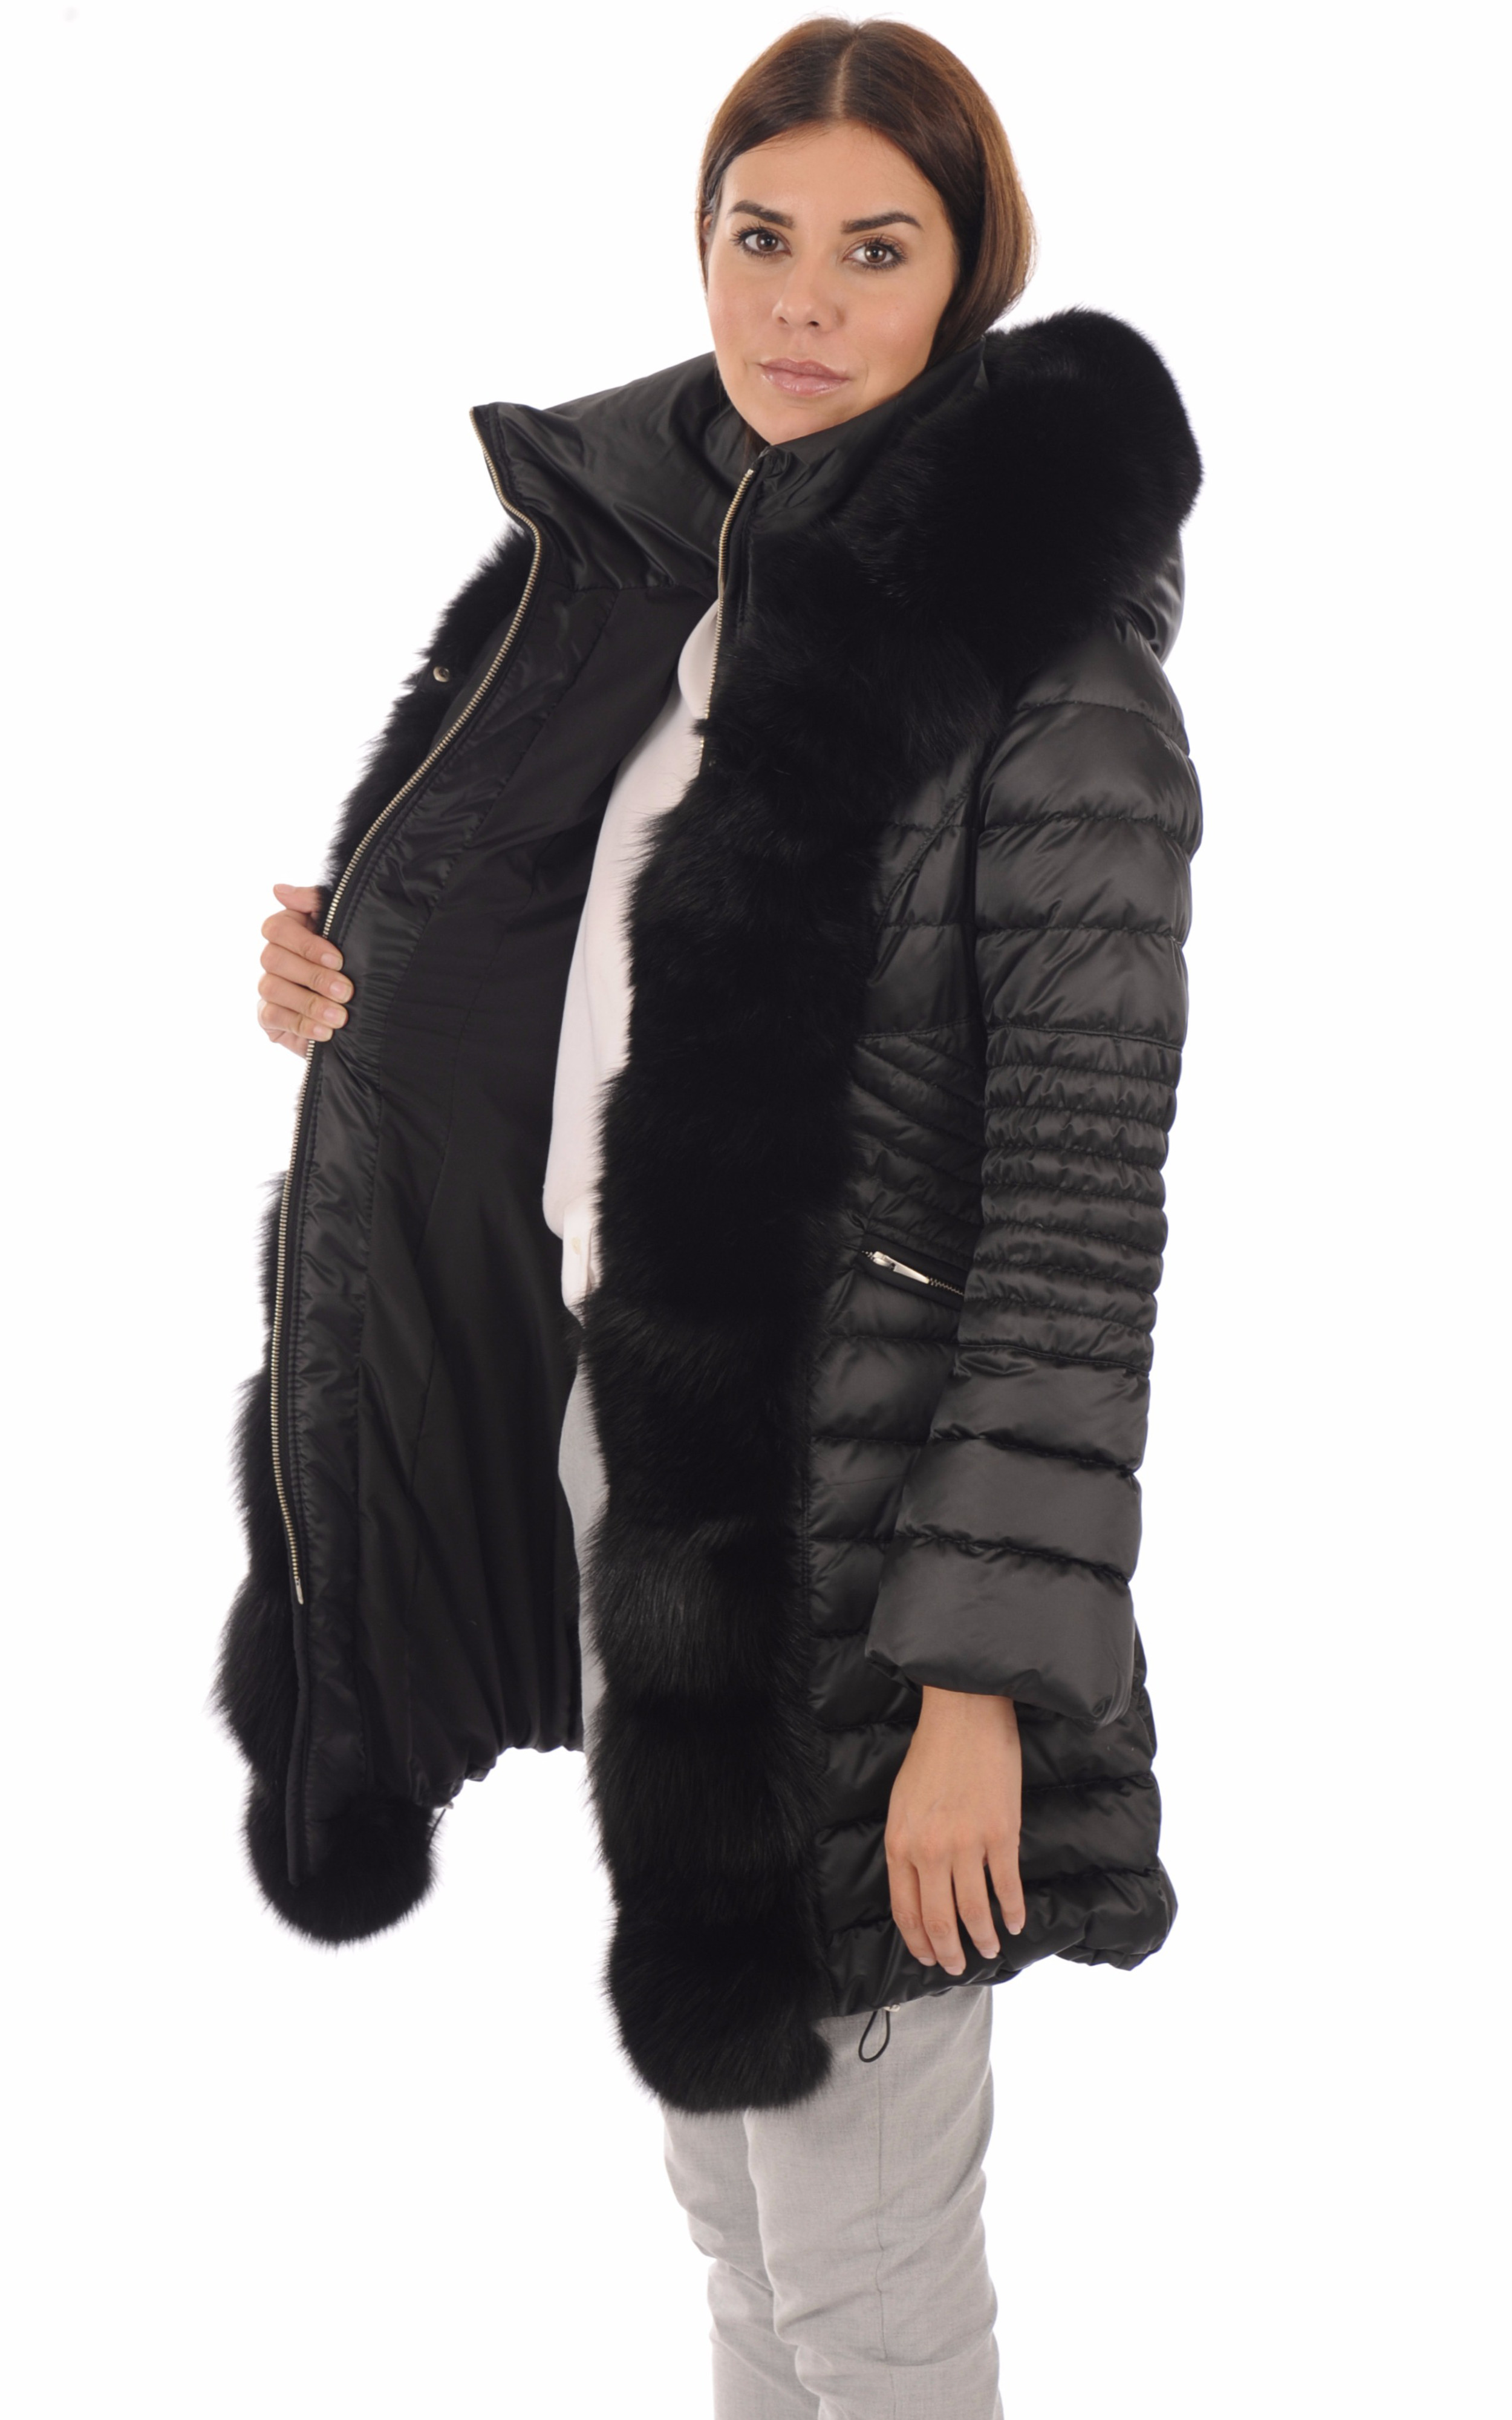 Doudoune Chic renard noir femme Flo&Clo